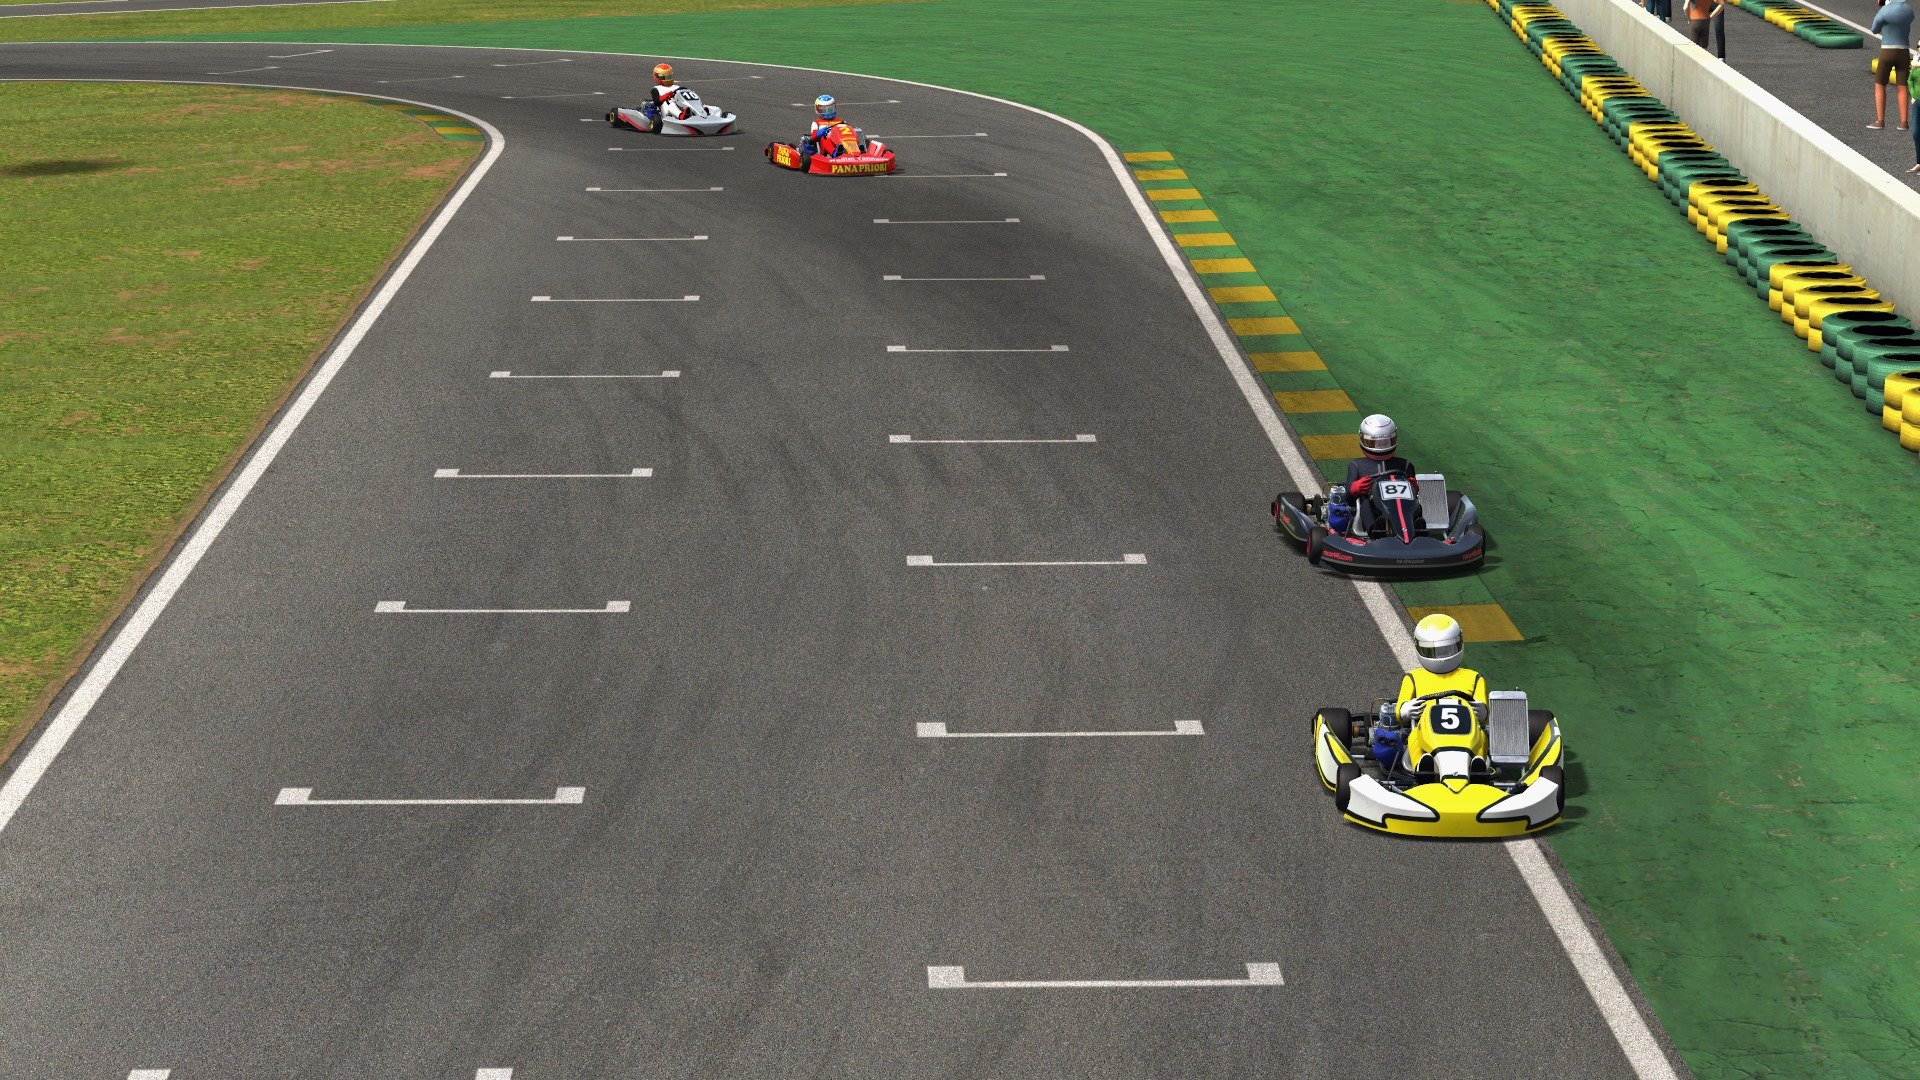 Circuito Ortona : Gsc extreme ortona kart track preview inside sim racing